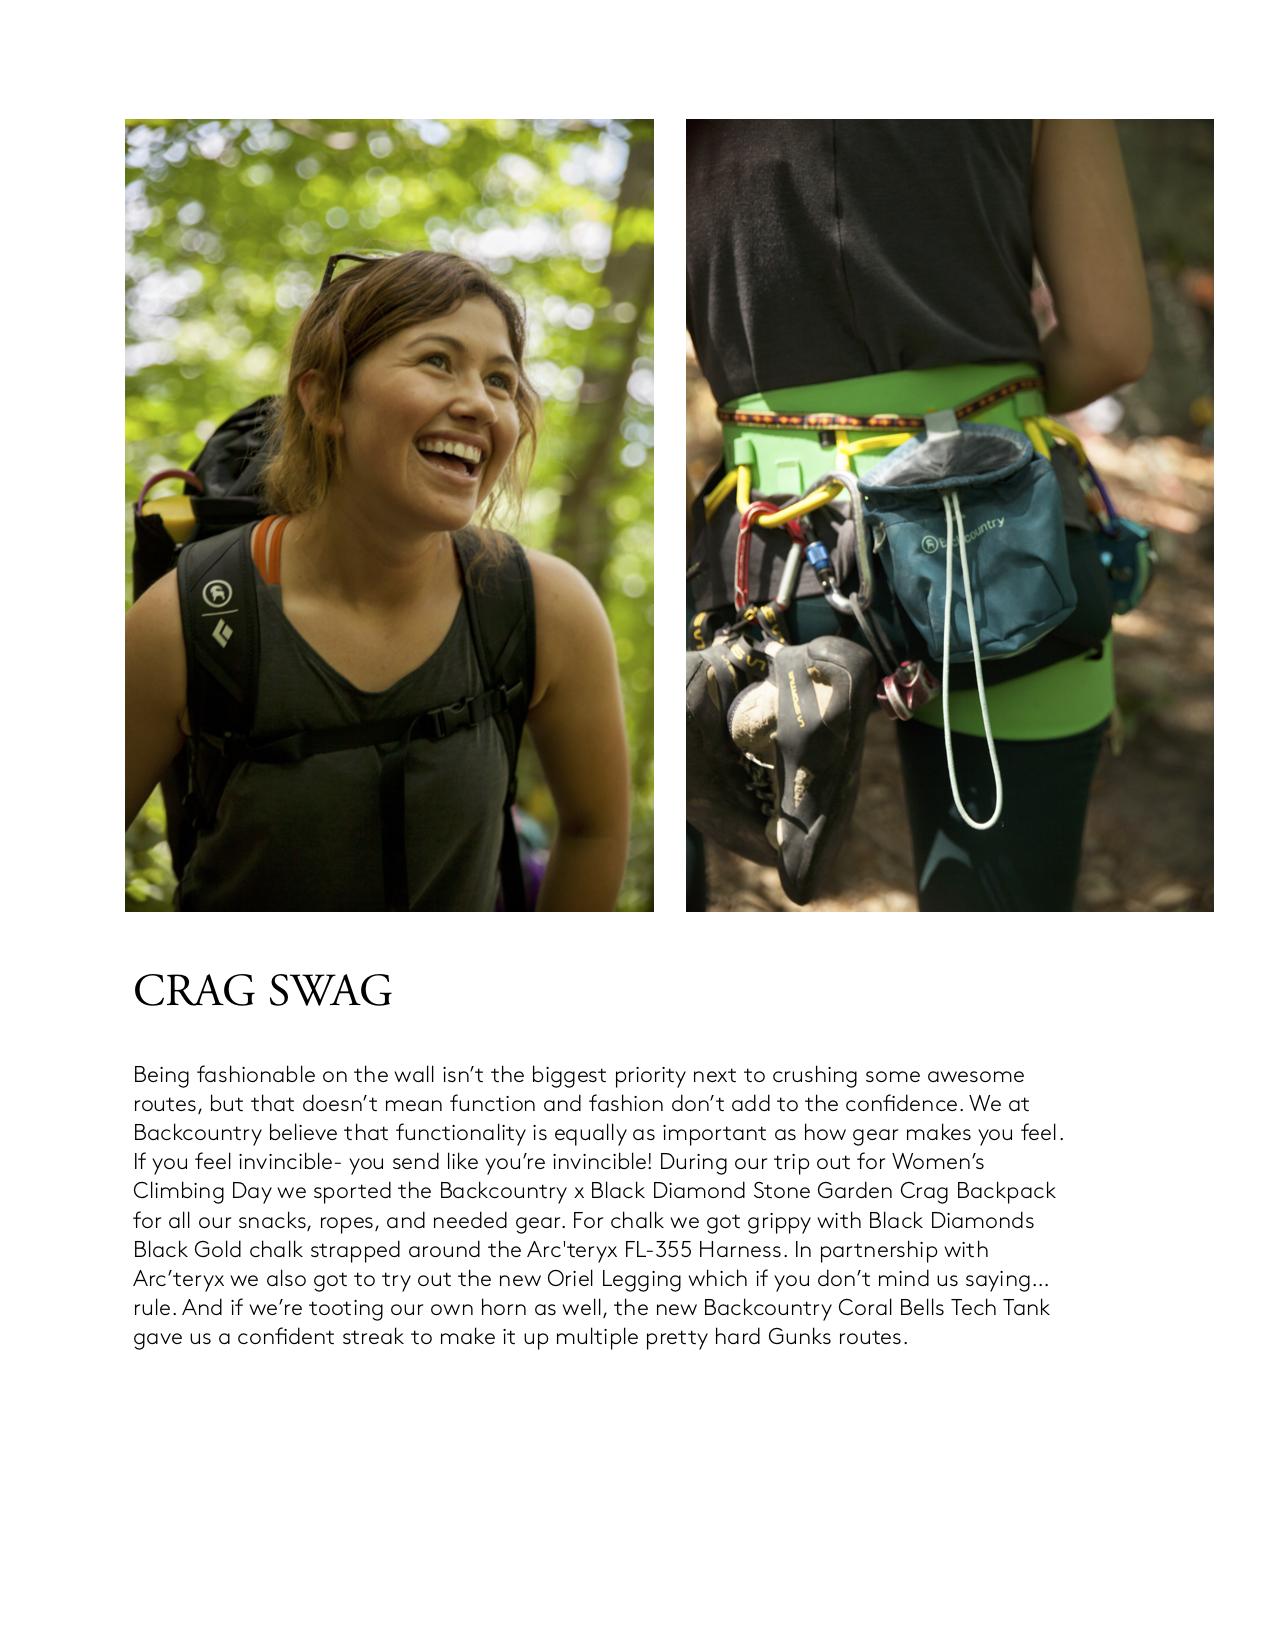 Backcountry+DO Womens Climbing content assets_pg8.jpg